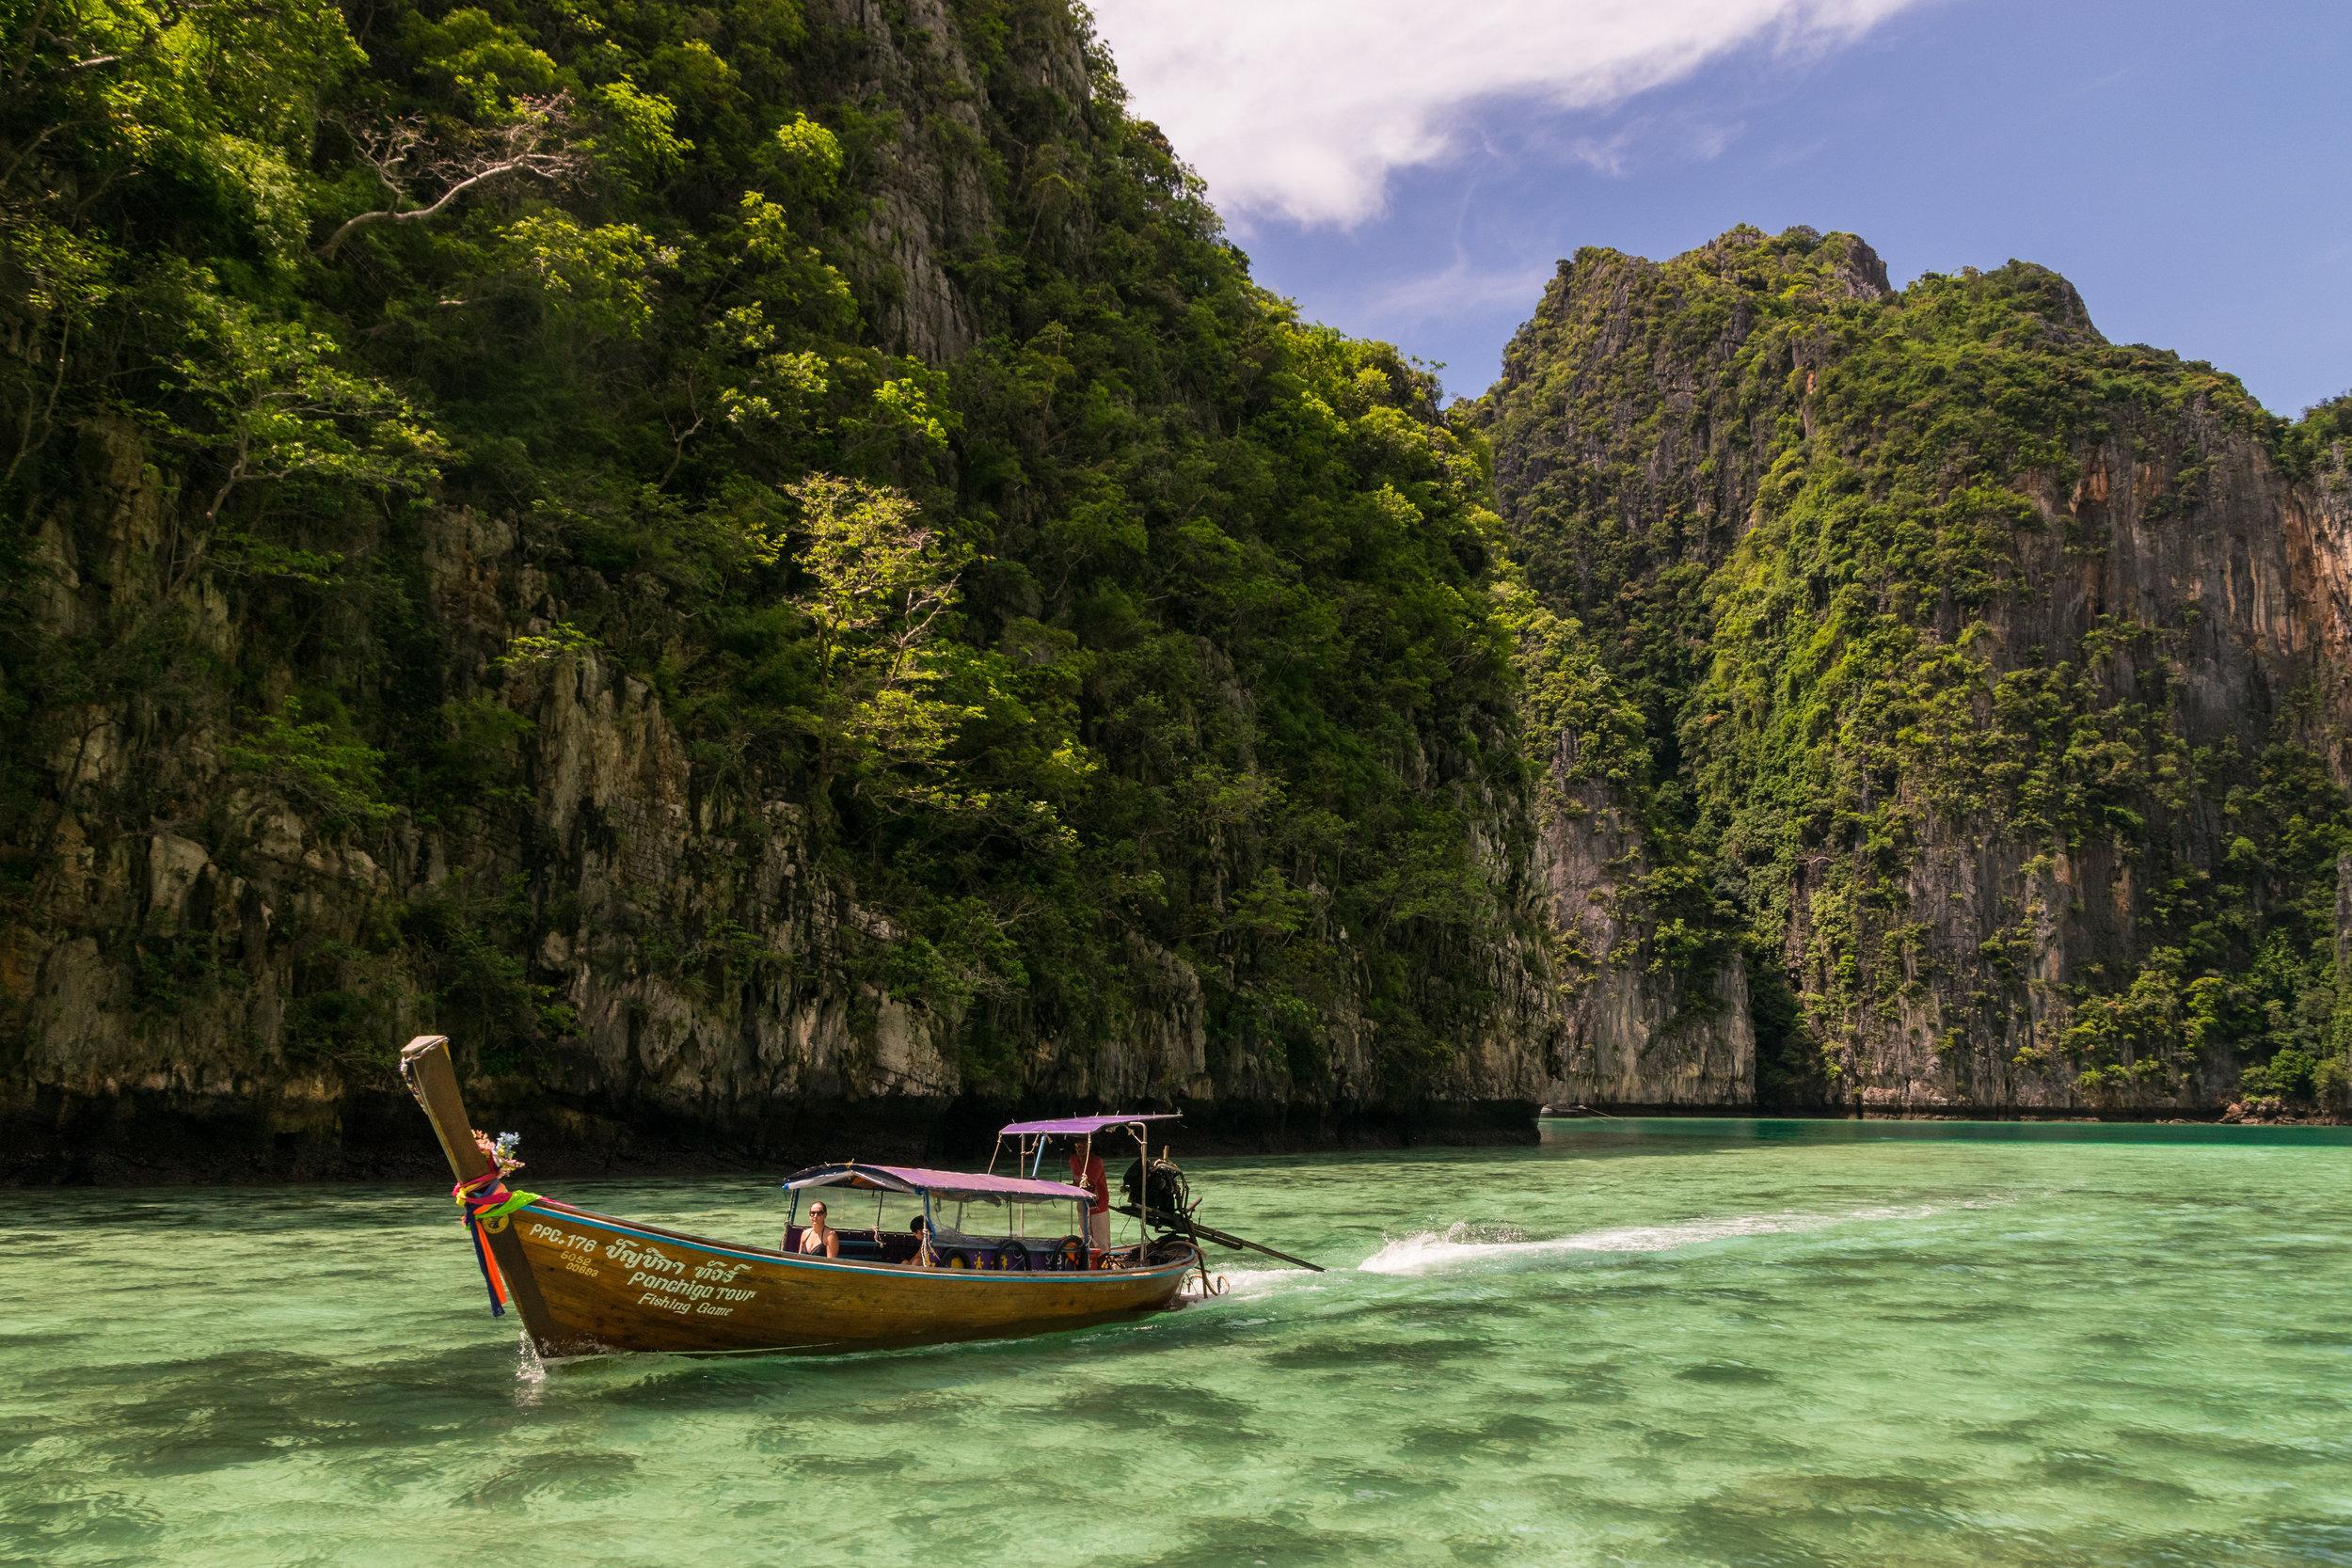 Thailand_Phuket+islands_boat-1.jpg